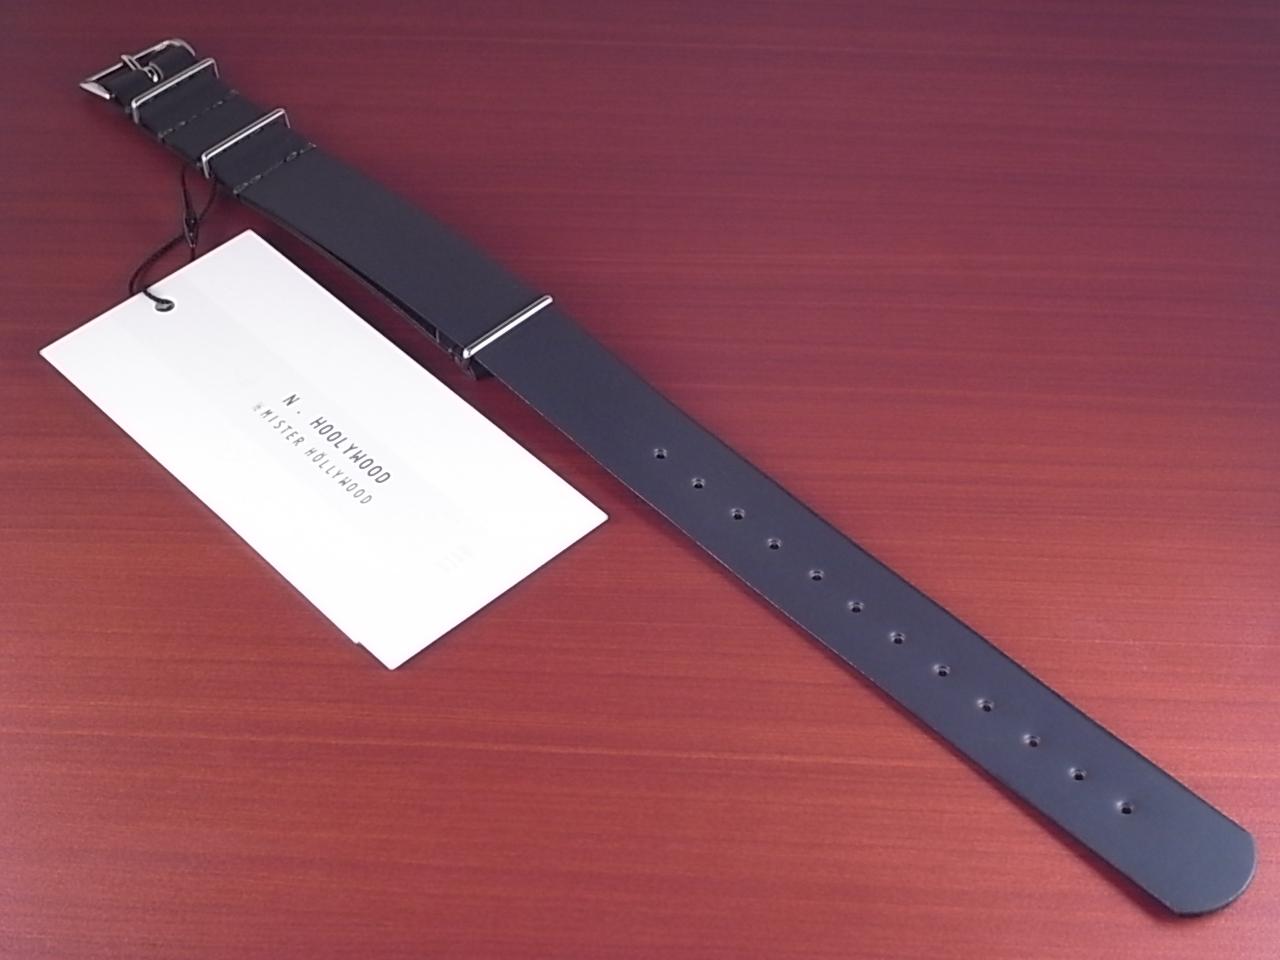 N.ハリウッド×キュリオスキュリオ コラボNATOコードバン革ベルトのメイン写真